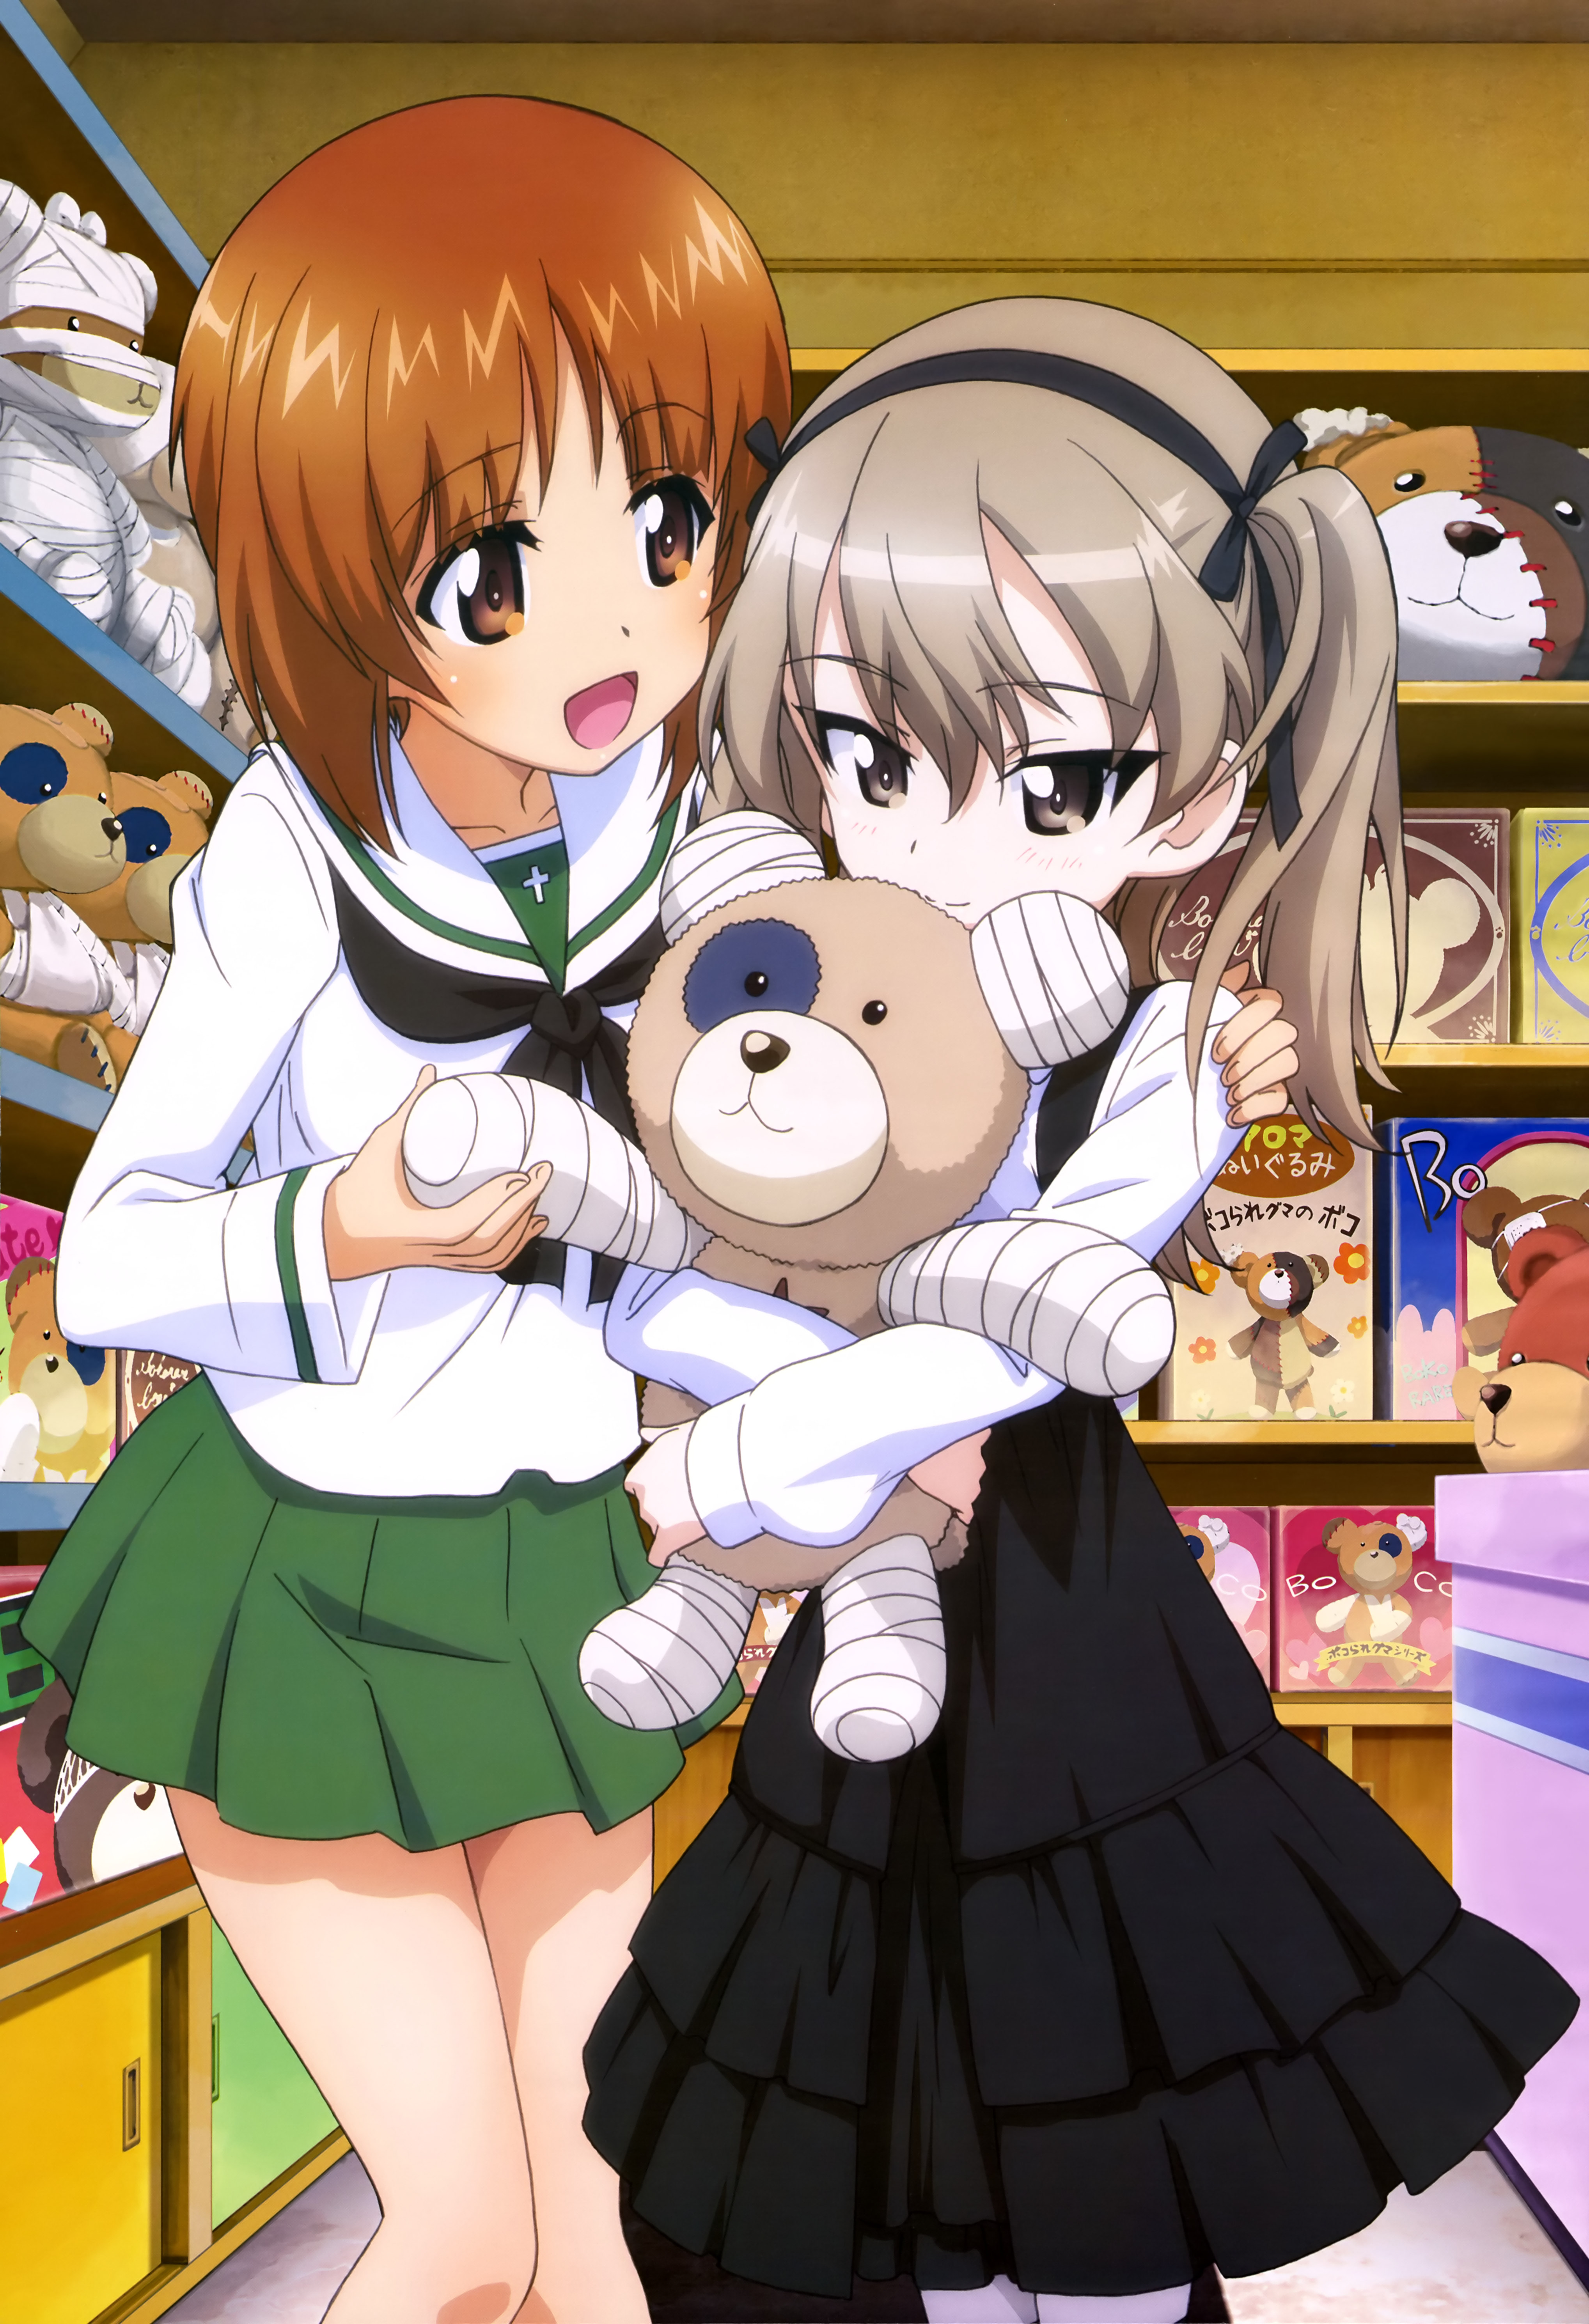 NyanType-Magazine-January-2016-anime-poster-girls und panzer